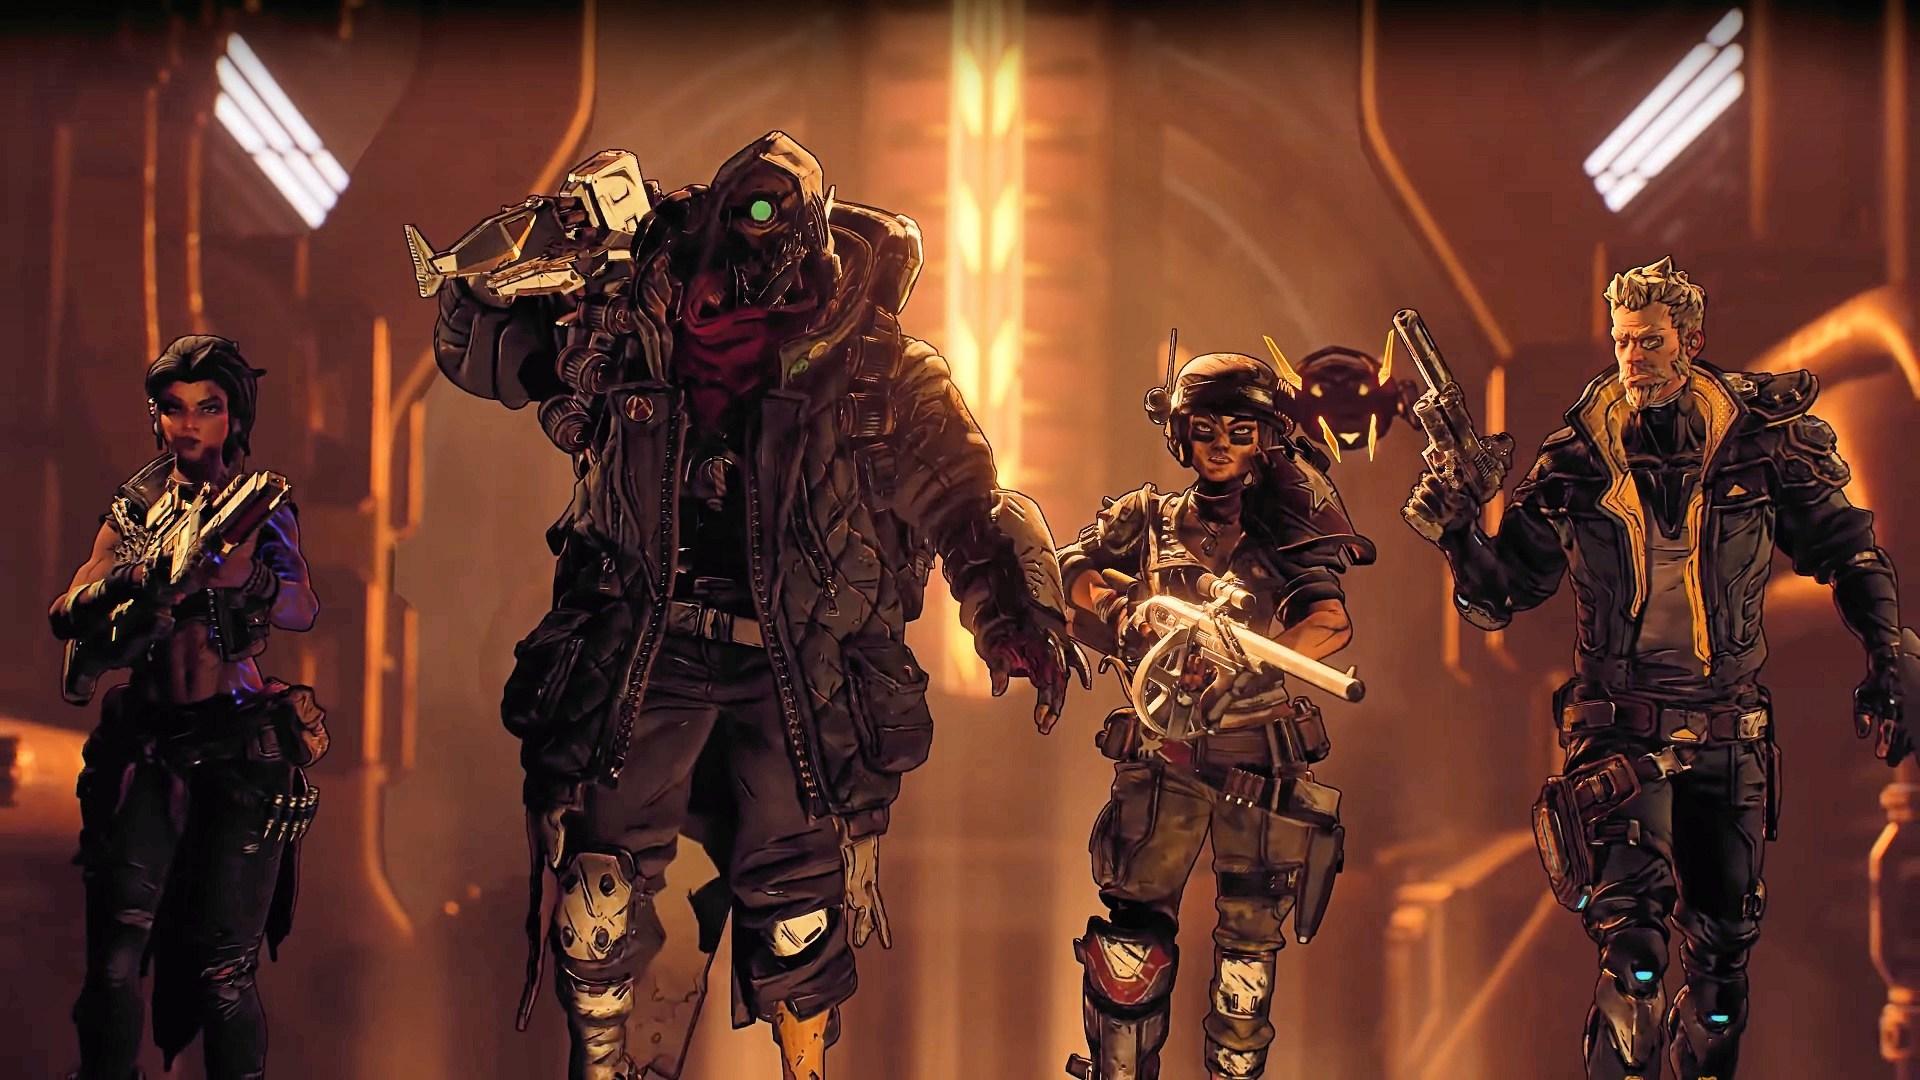 Borderlands 3, Vault Hunter, Gearbox Software, Epic Games, Zane, Amara, FL4K, Moze